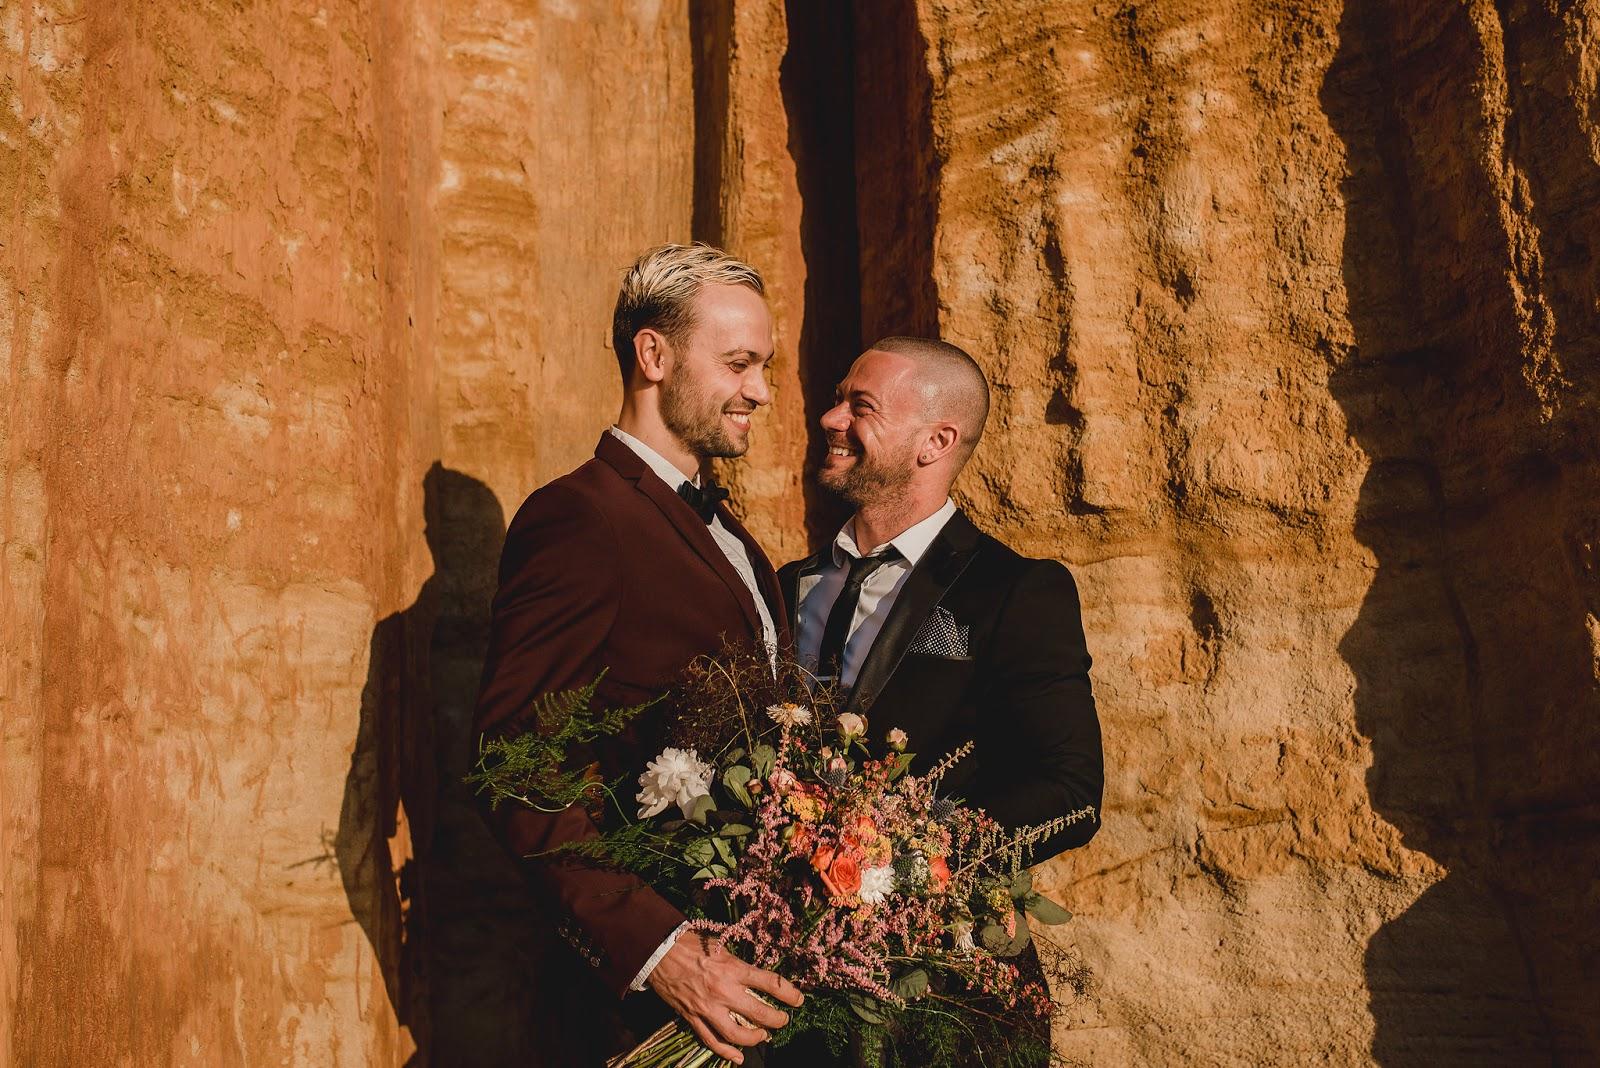 STYLED: LORENZO + MARTIN | BEACH WEDDING RECEPTION STYLED SHOOT MELBOURNE VIC